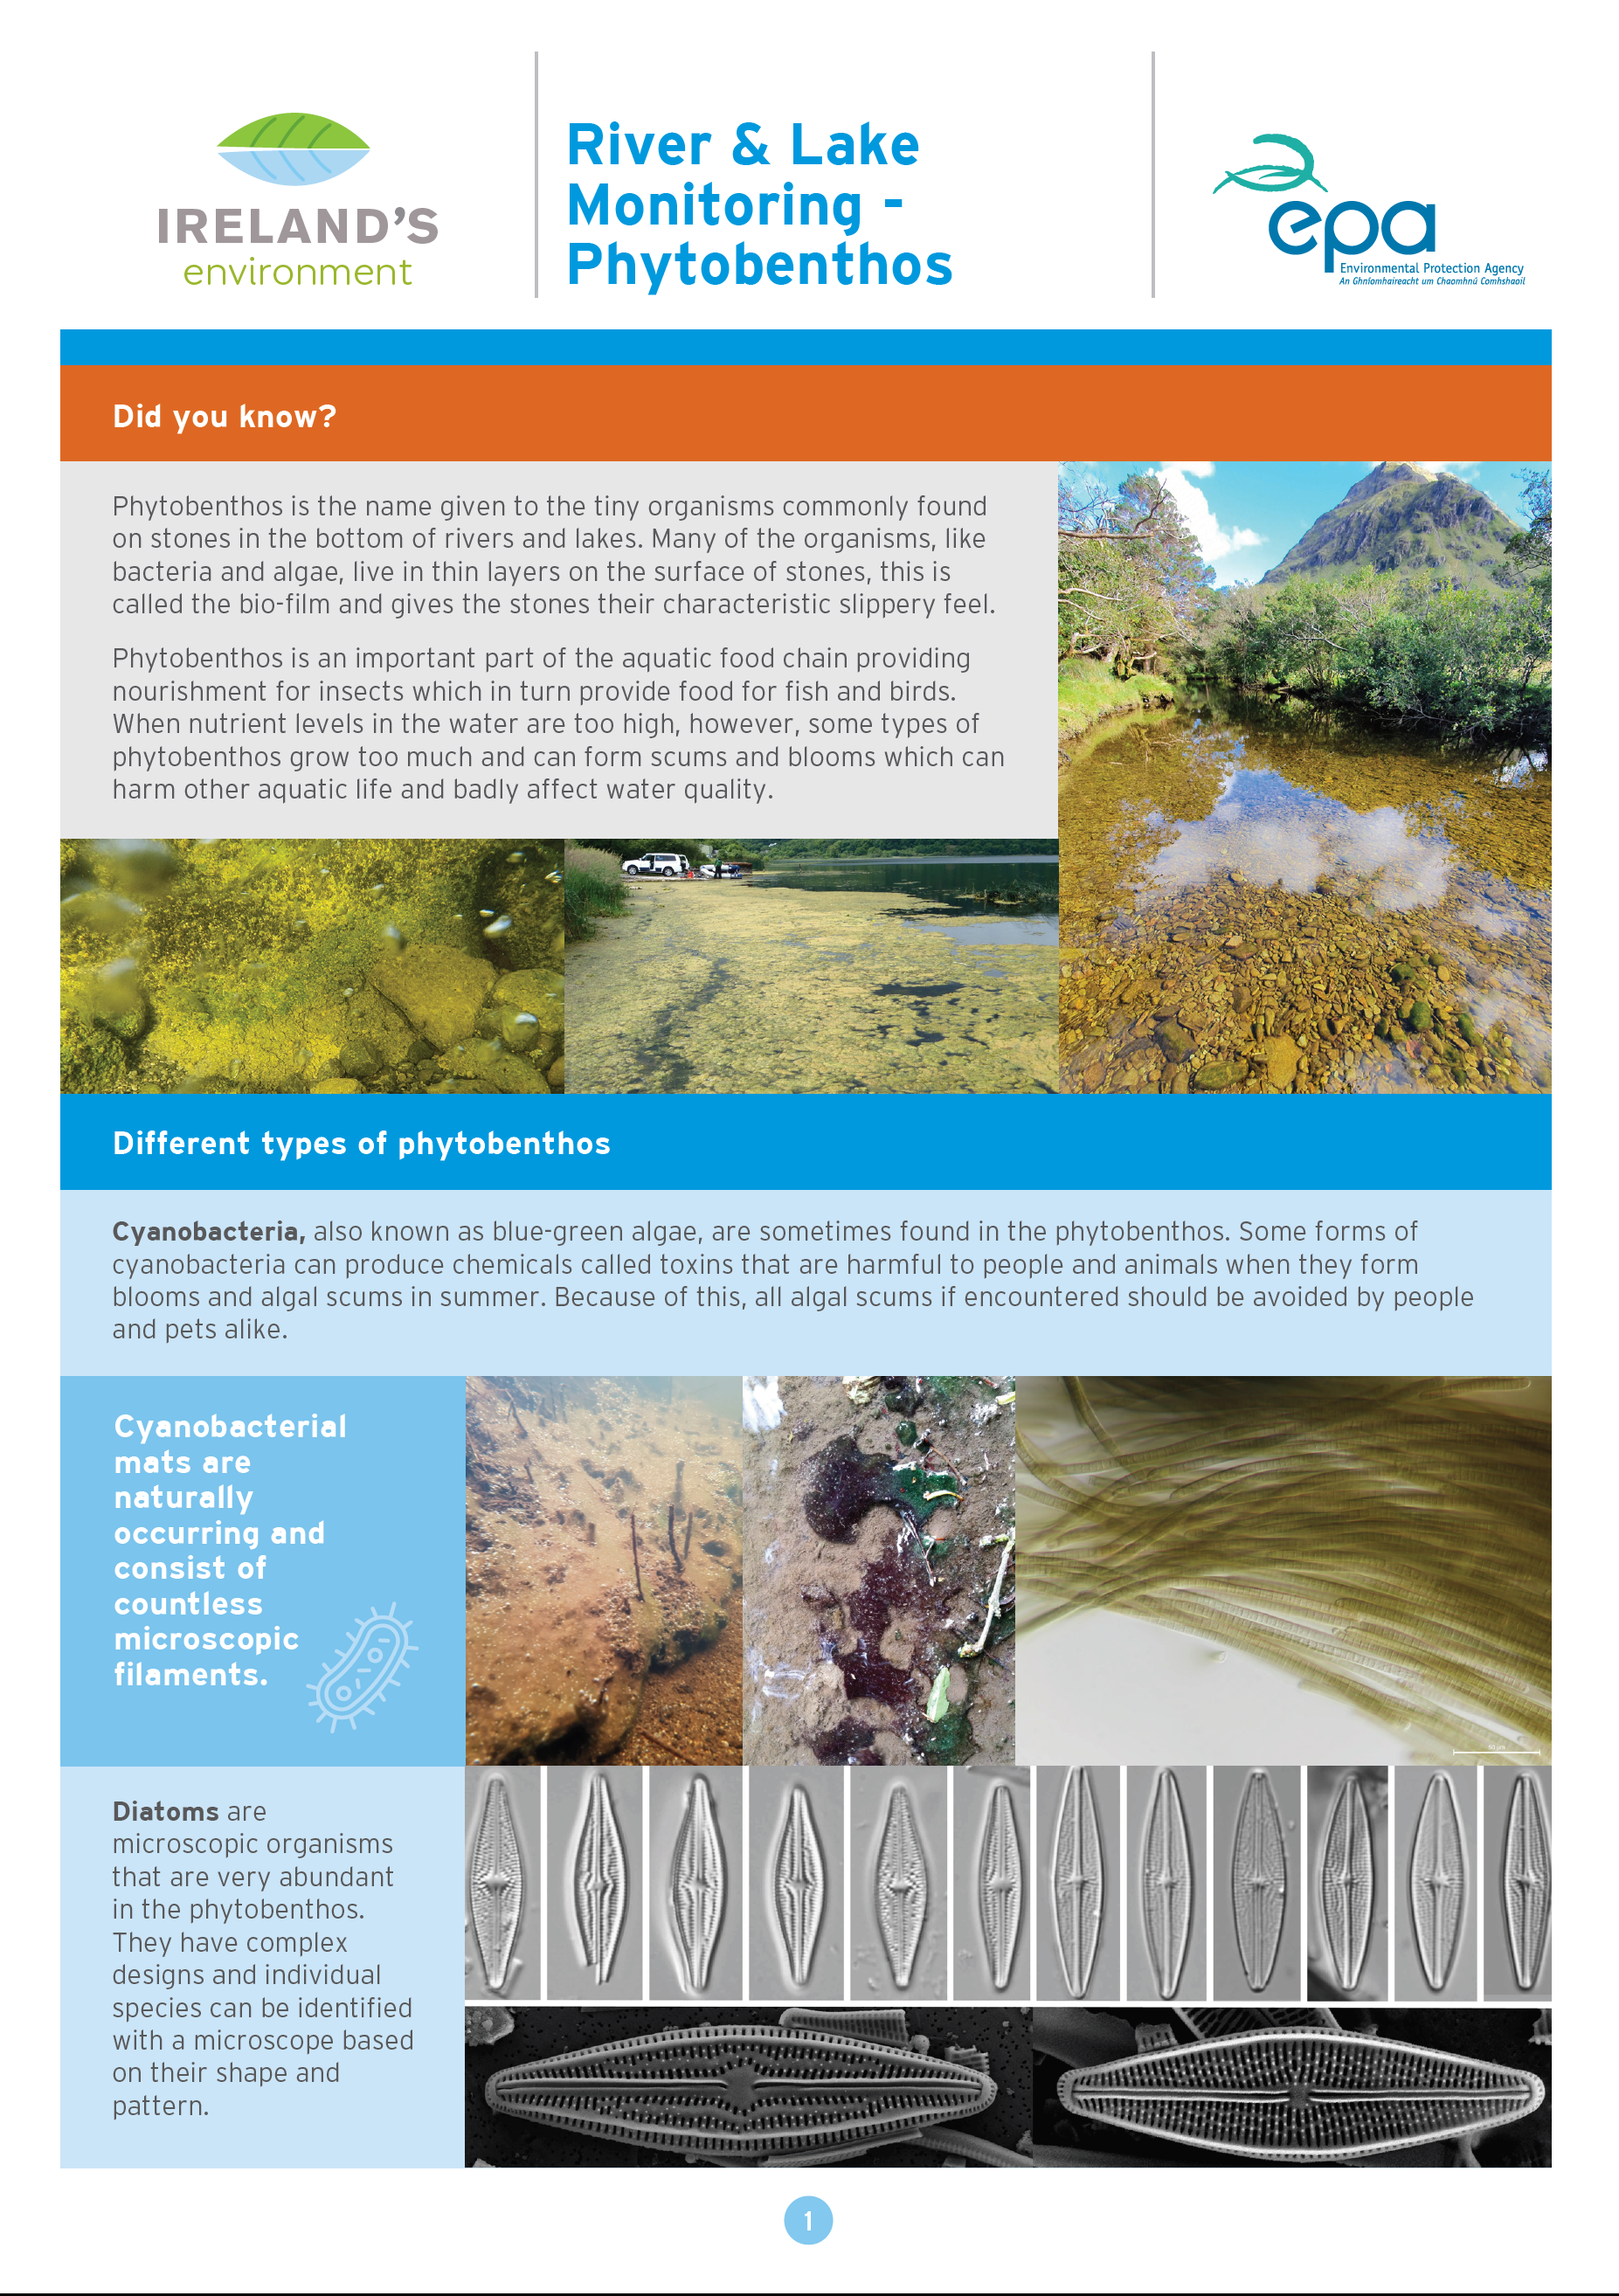 River and lake phytobenthos monitoring factsheet